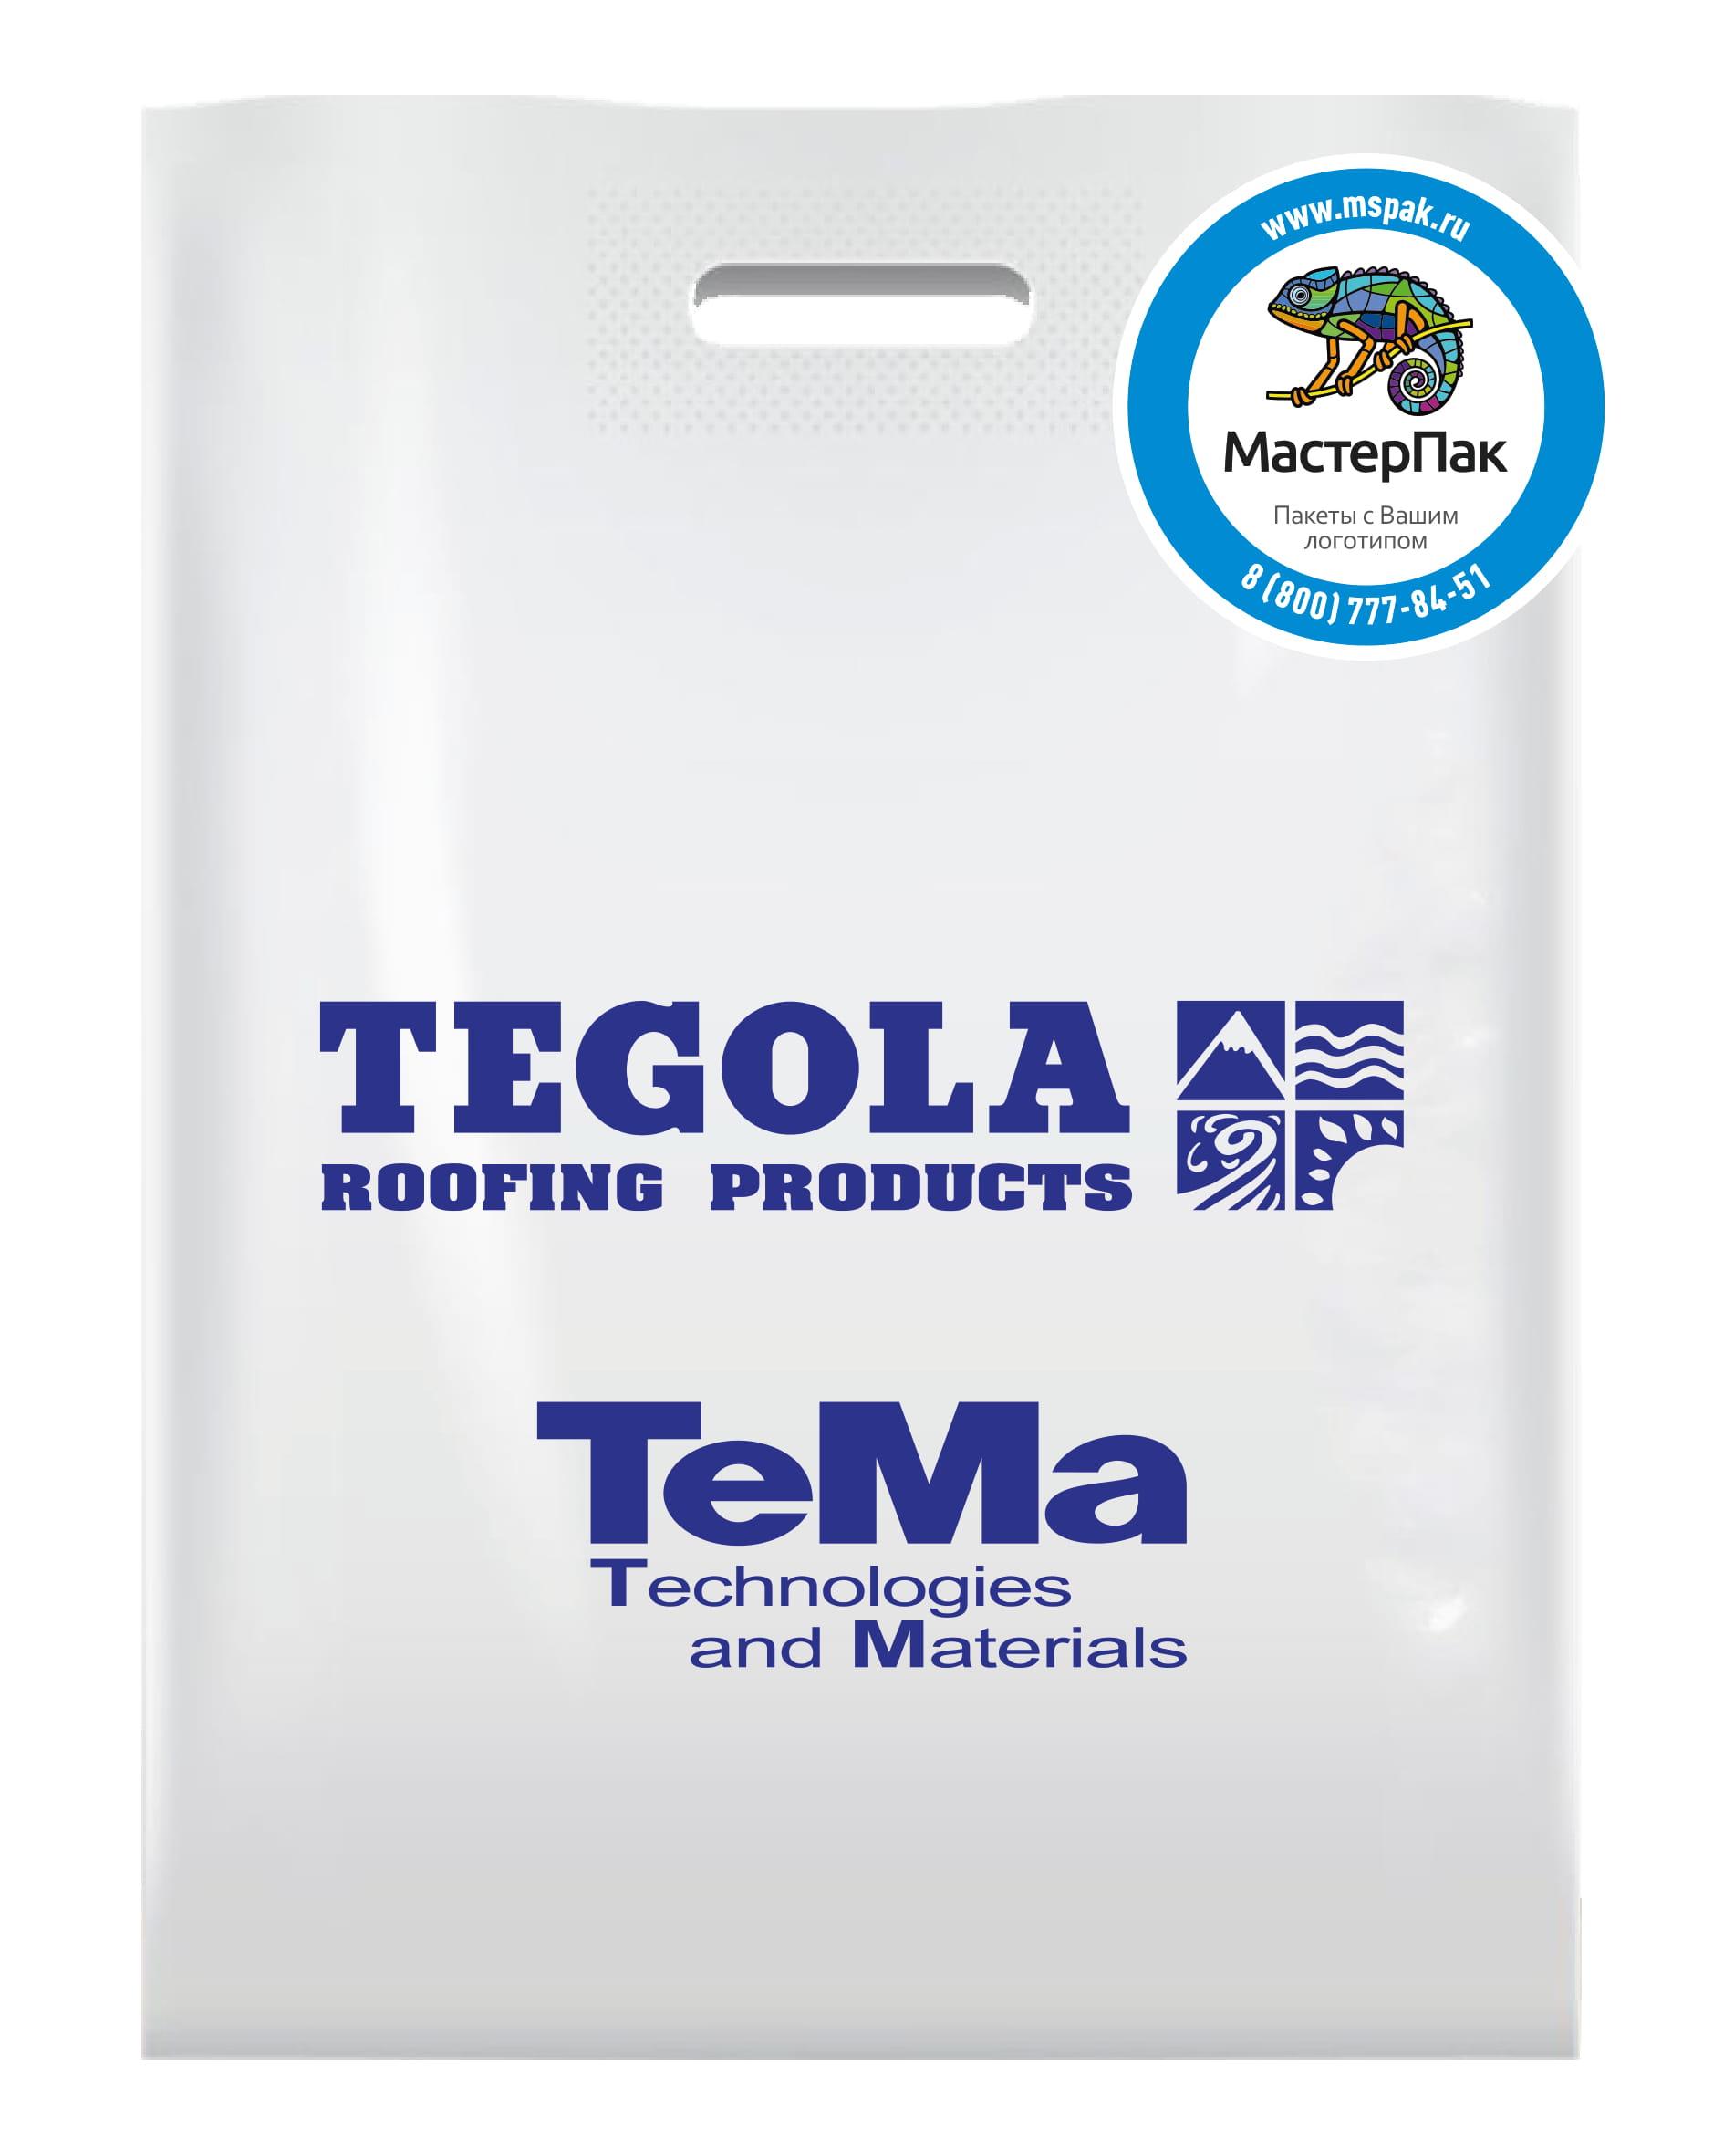 Пакет ПВД с логотипом производителя Tegola, Москва, 70 мкм, 30*40, белый